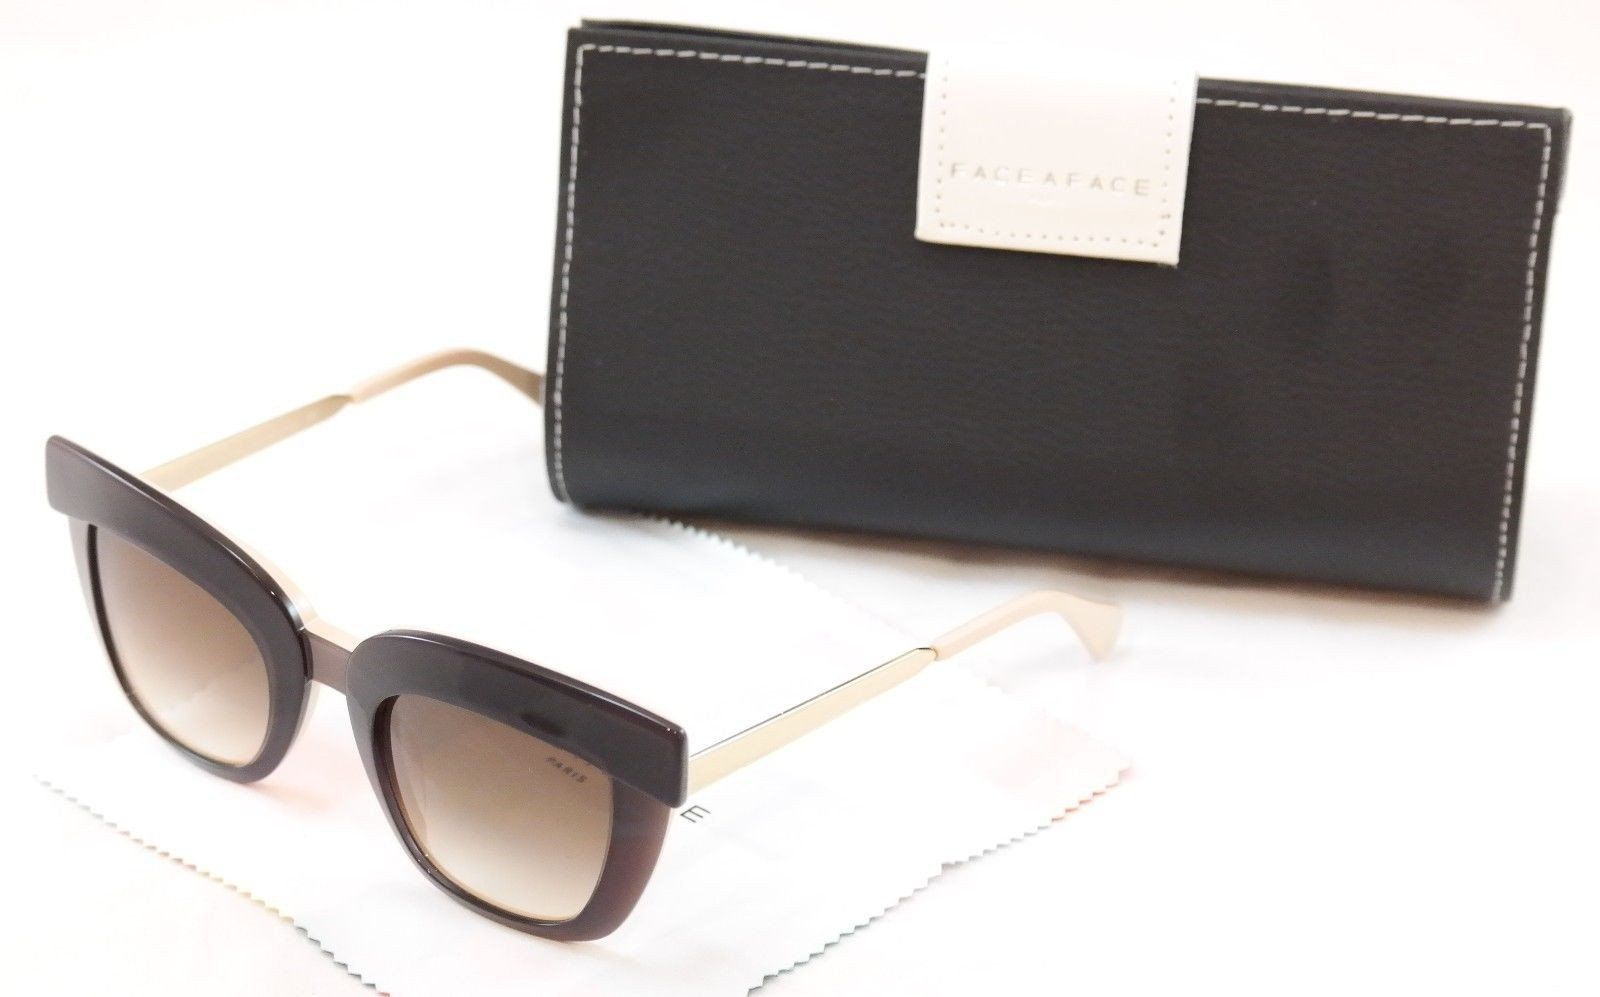 7dc1fa3483 Face A Face Sunglasses Dolce 2 3141 Dark Mauve   Opaque Nude Plastic Metal  Italy